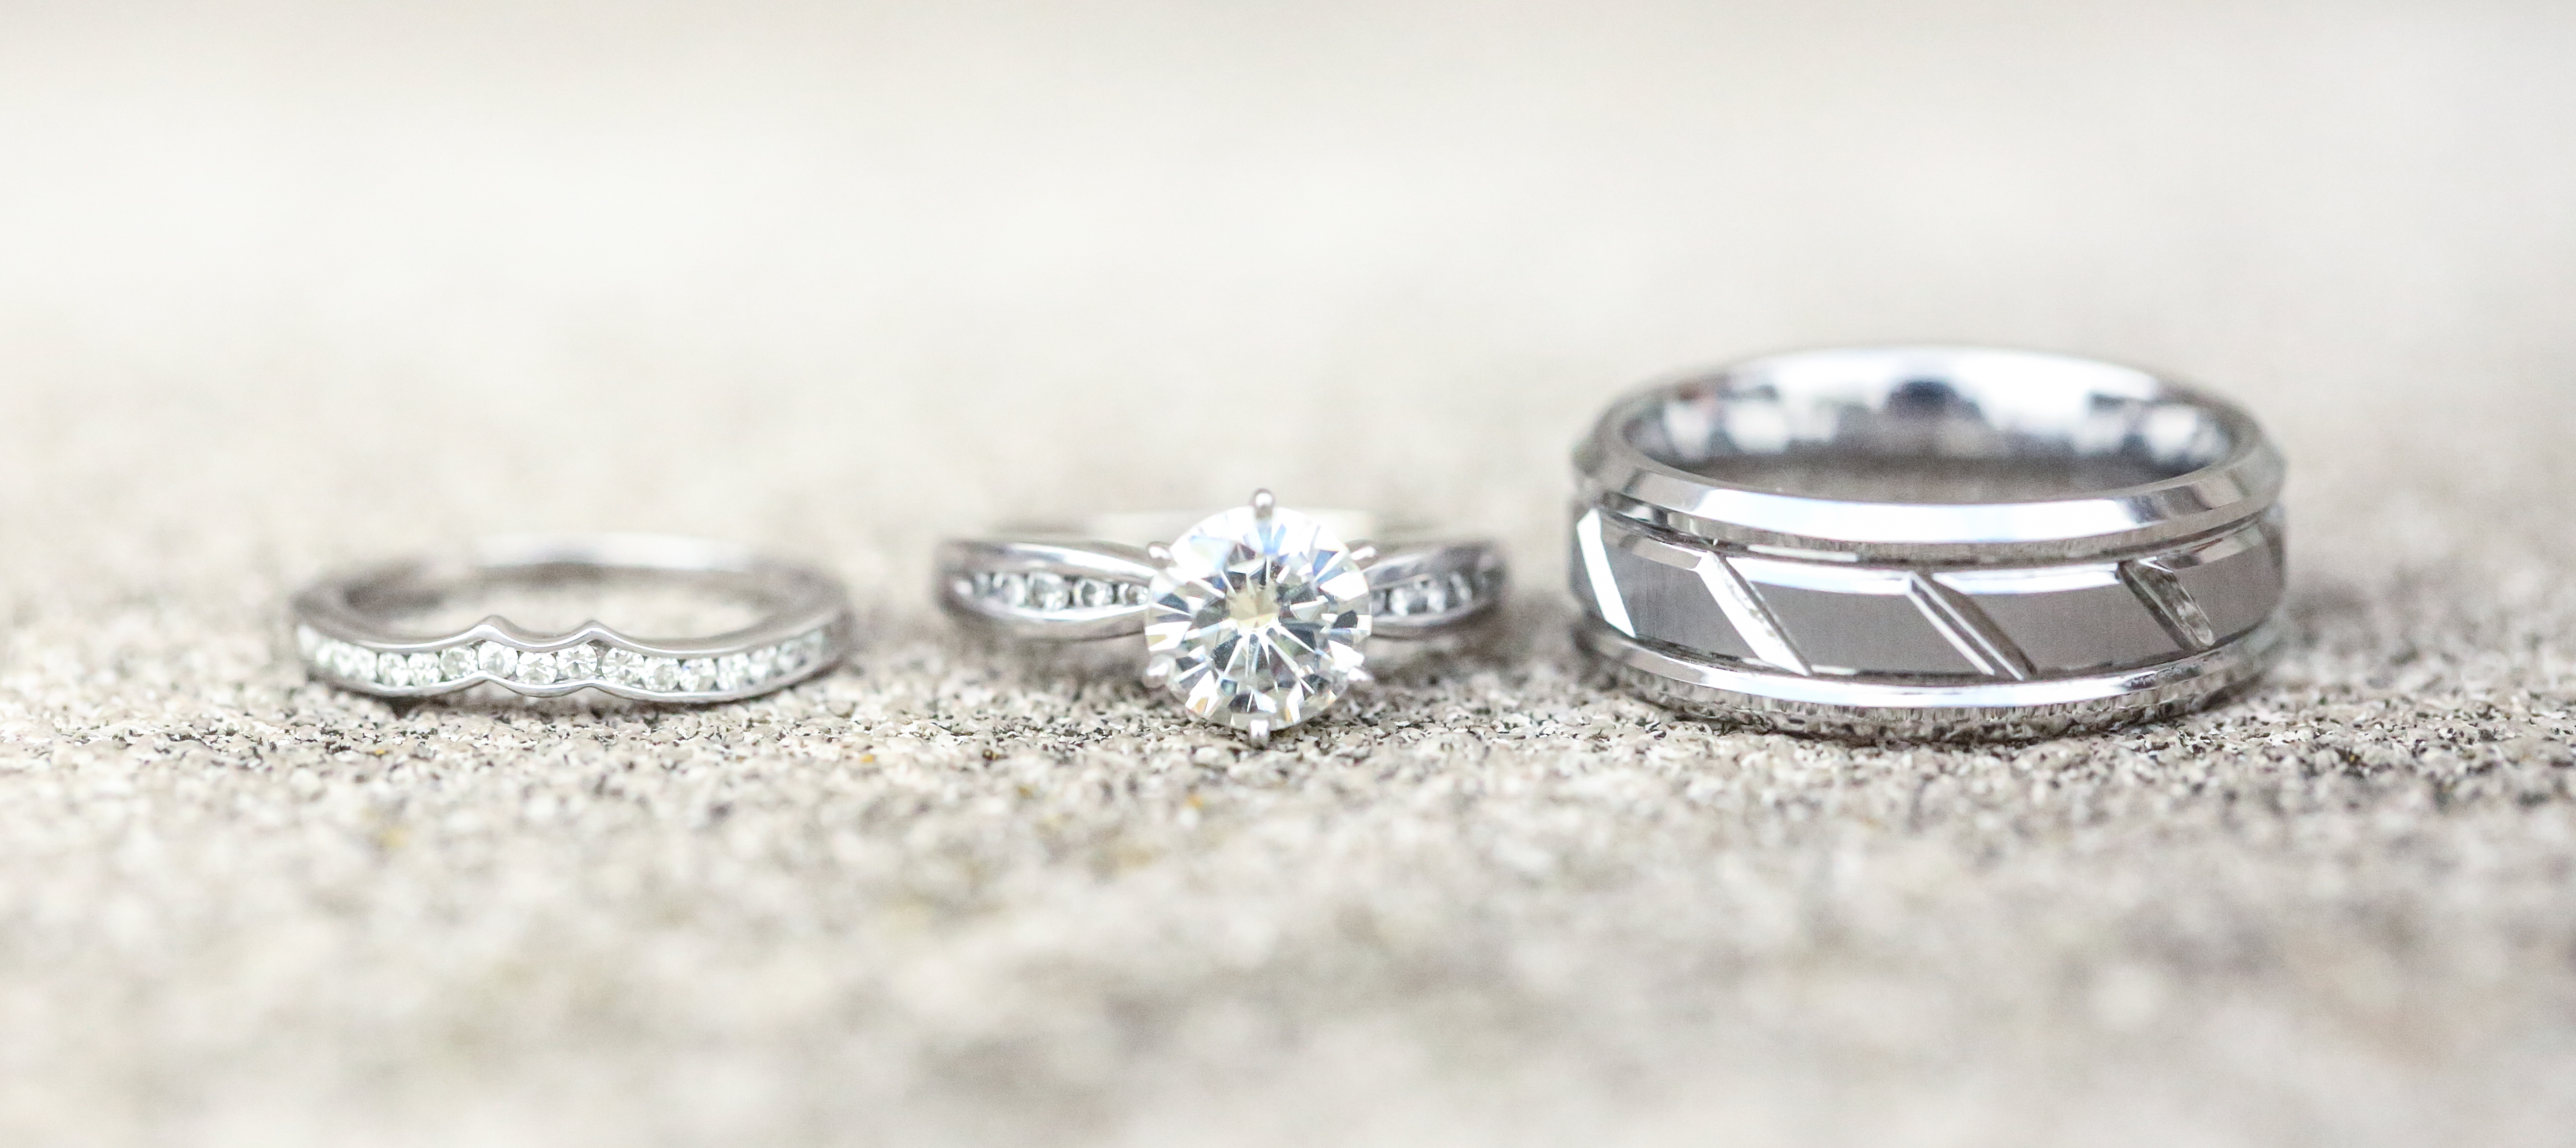 carillon-wedding-richmond-virginia-wedding-heather-michelle-photography-1-of-1-7